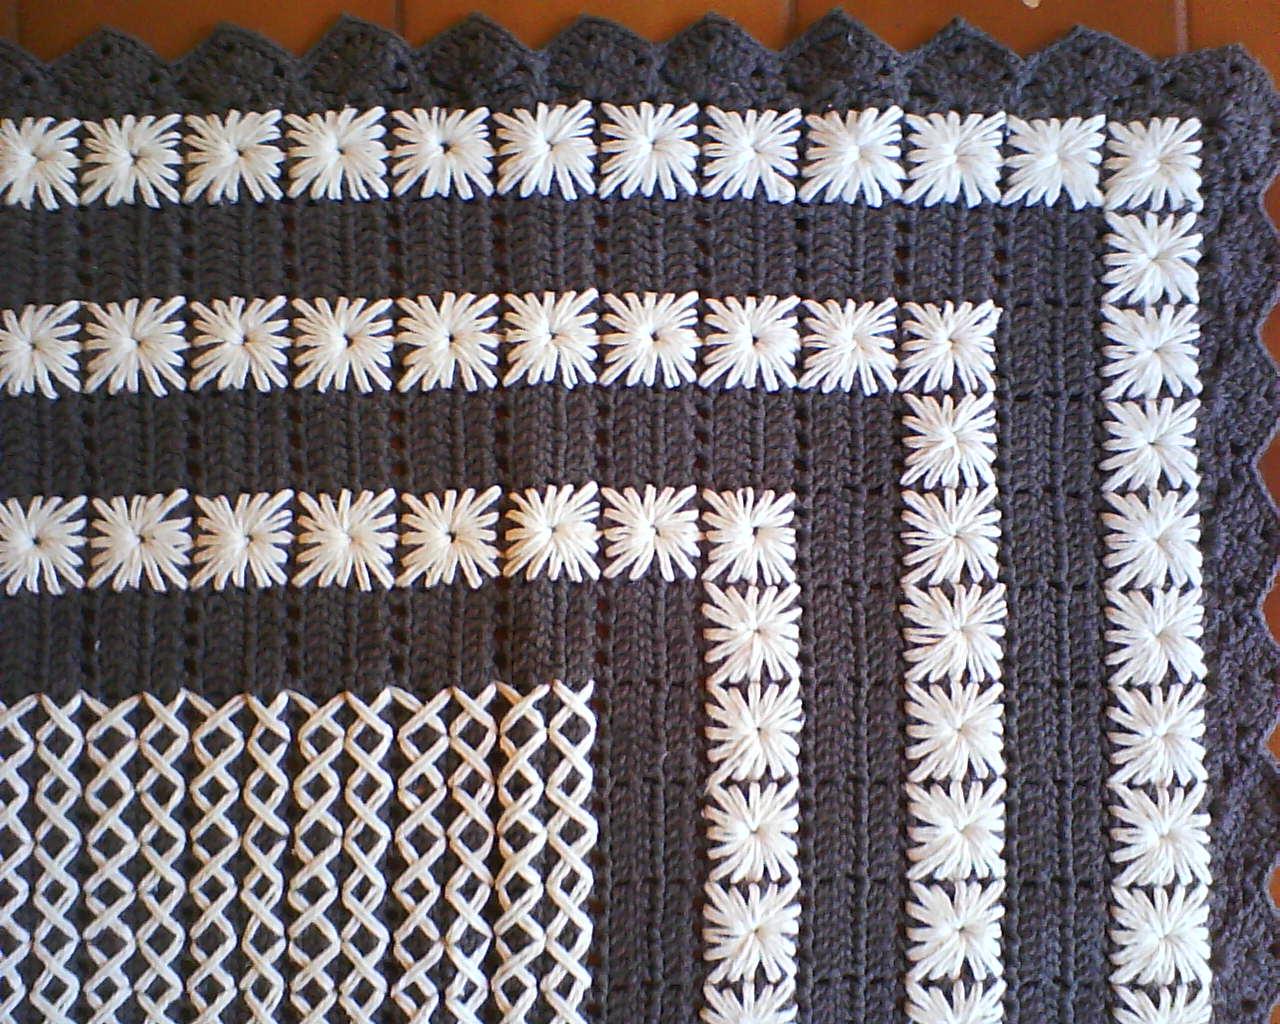 Tapete Moderno De Croche Cor -> Tapetes De Croche Para Sala